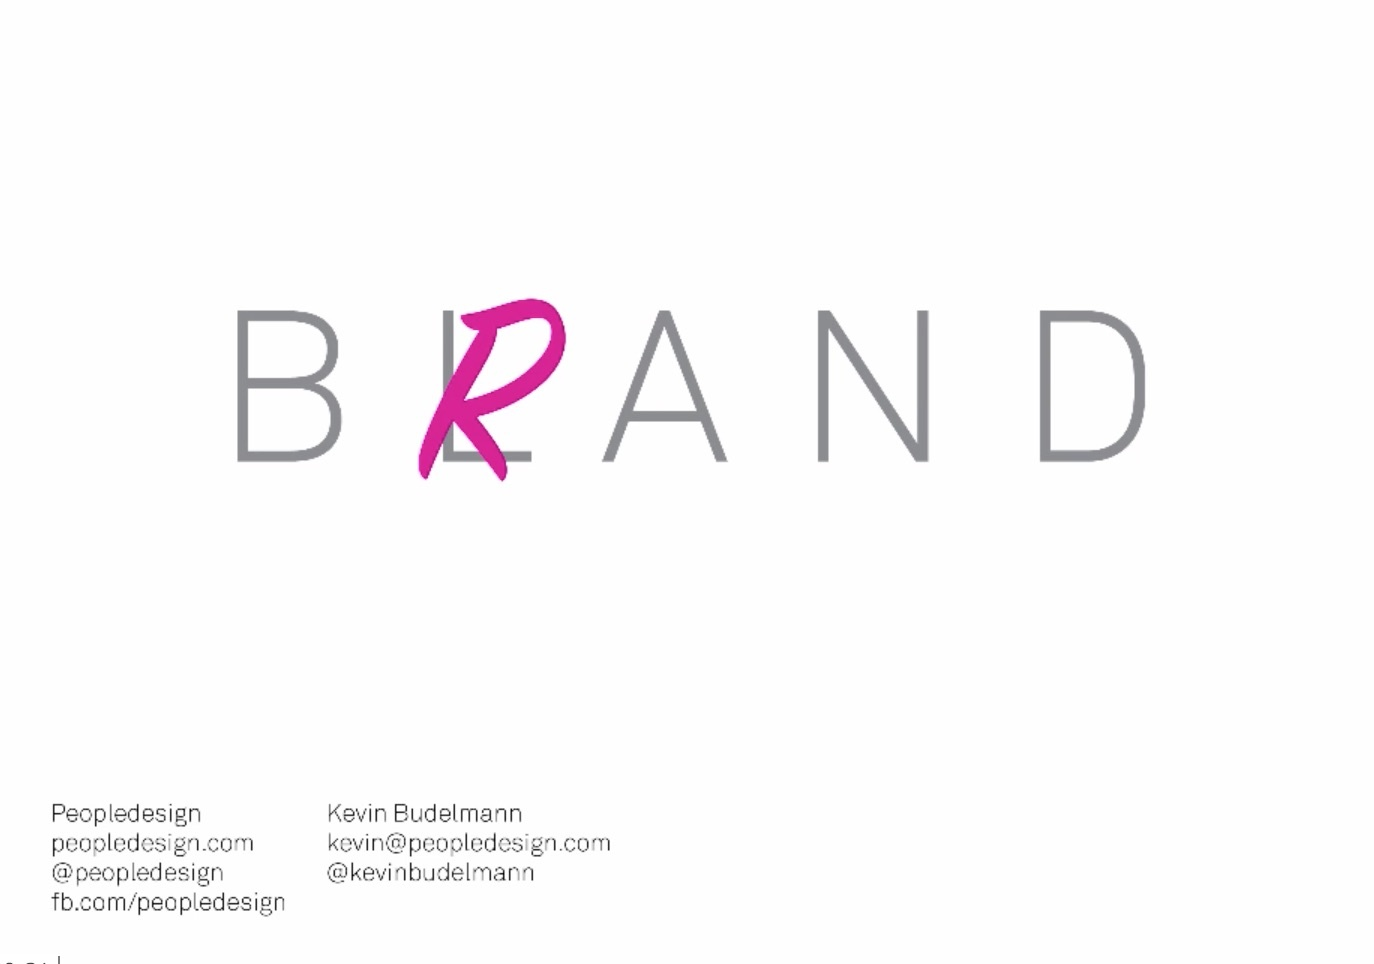 Branding Not Blanding Webinar